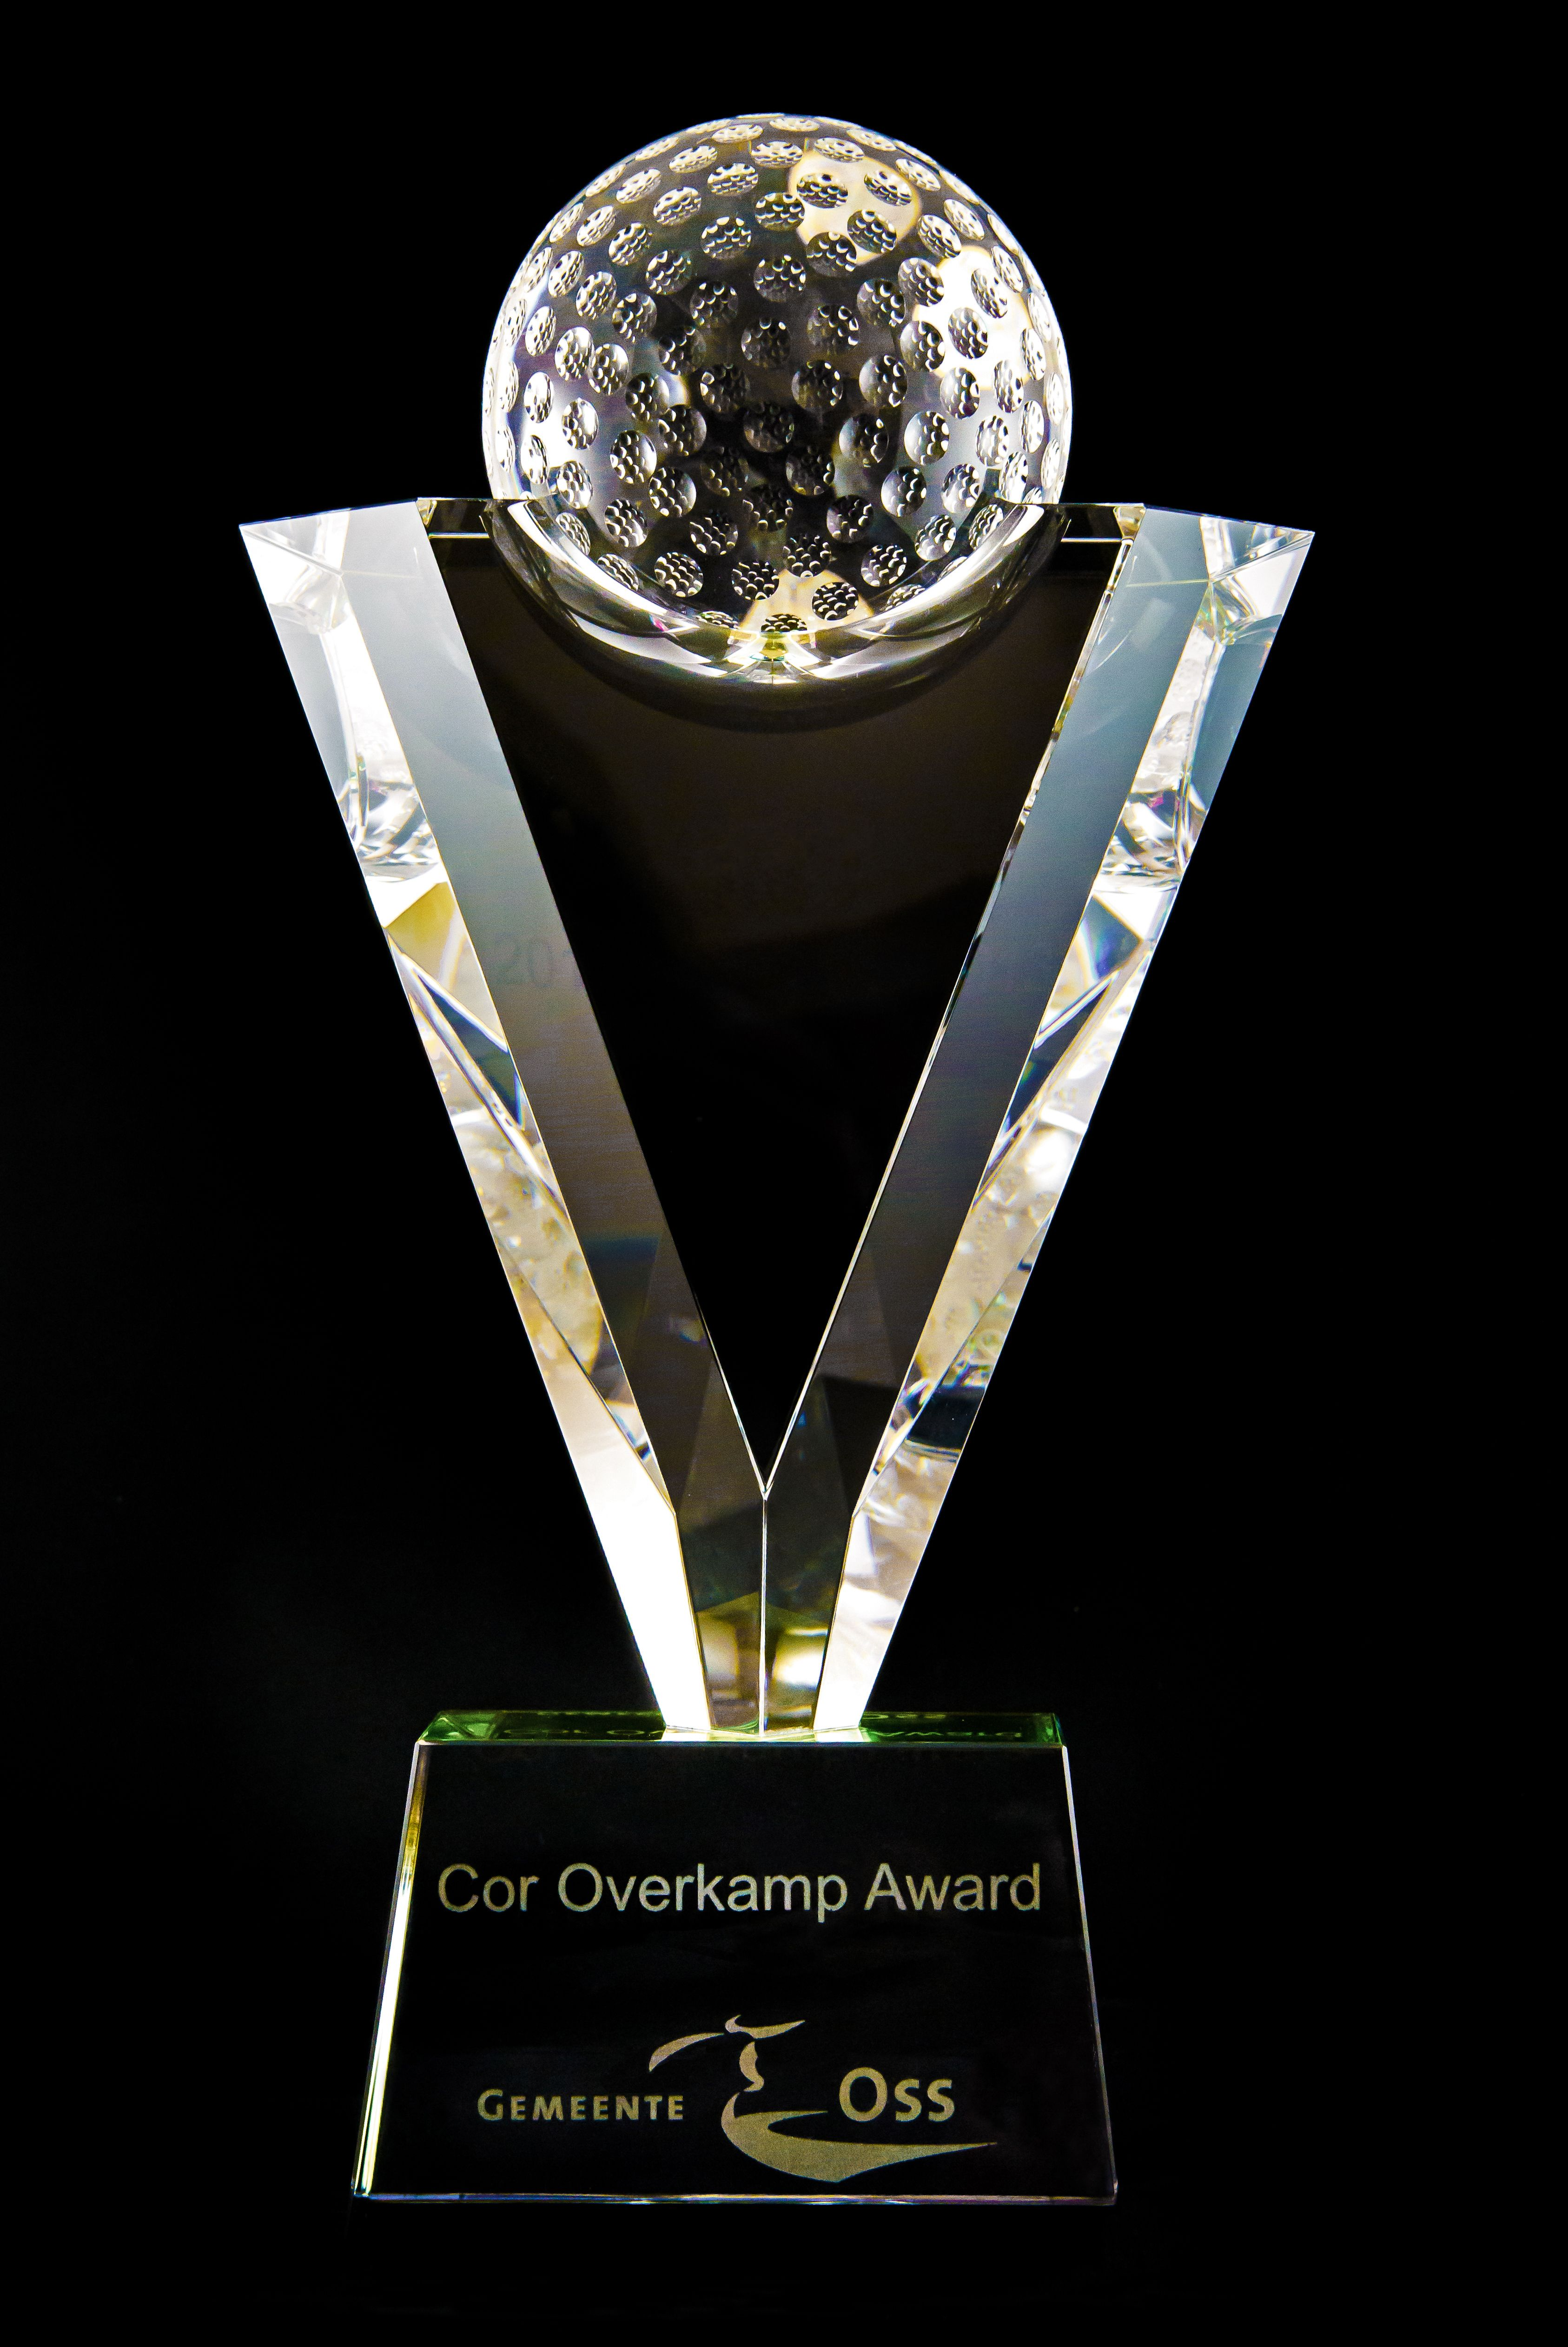 Foto uitreiking Cor Overkamp Award